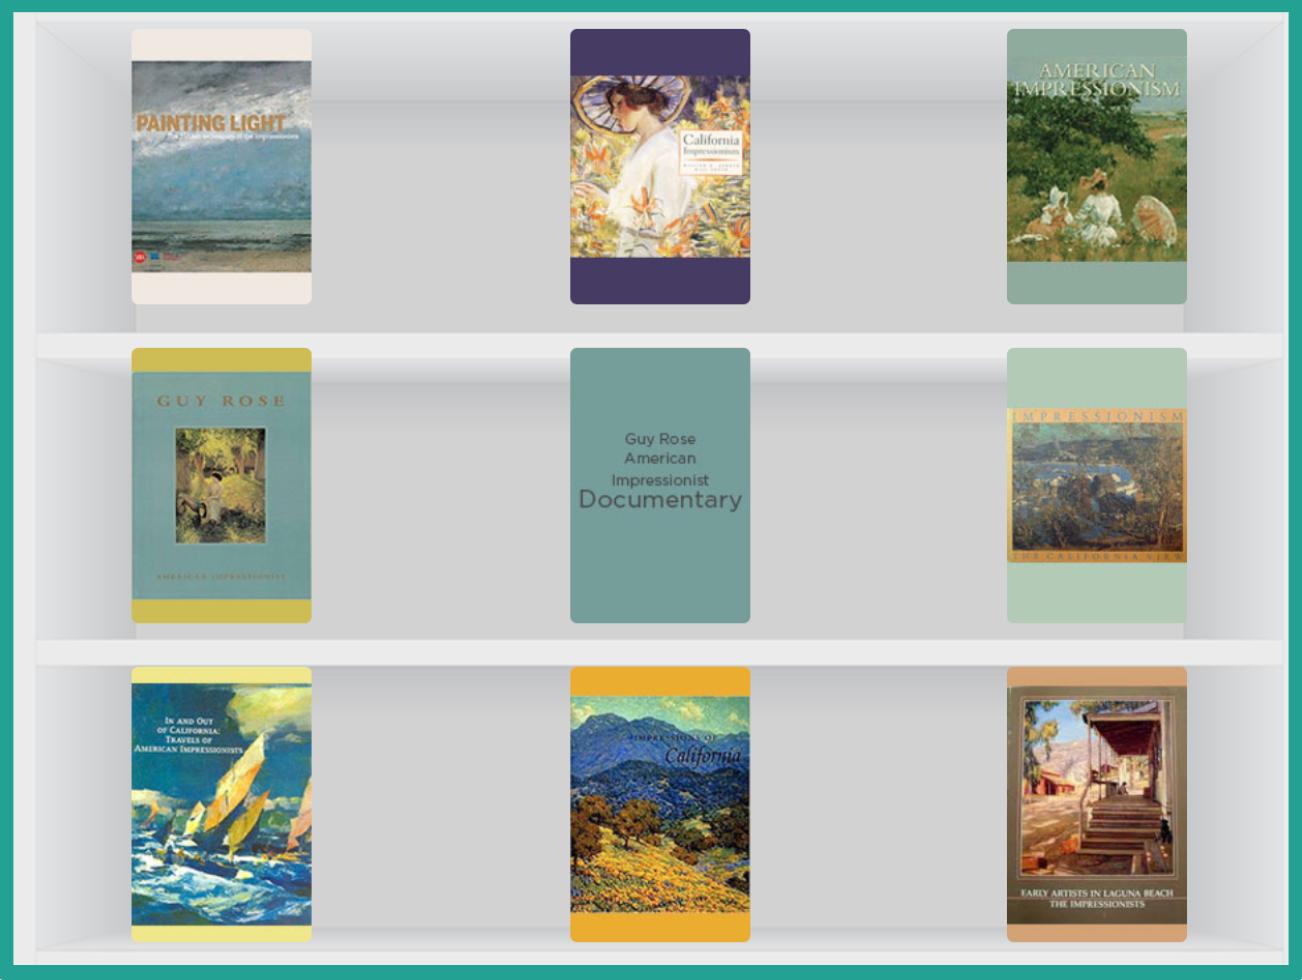 white bookshelf with art book covers